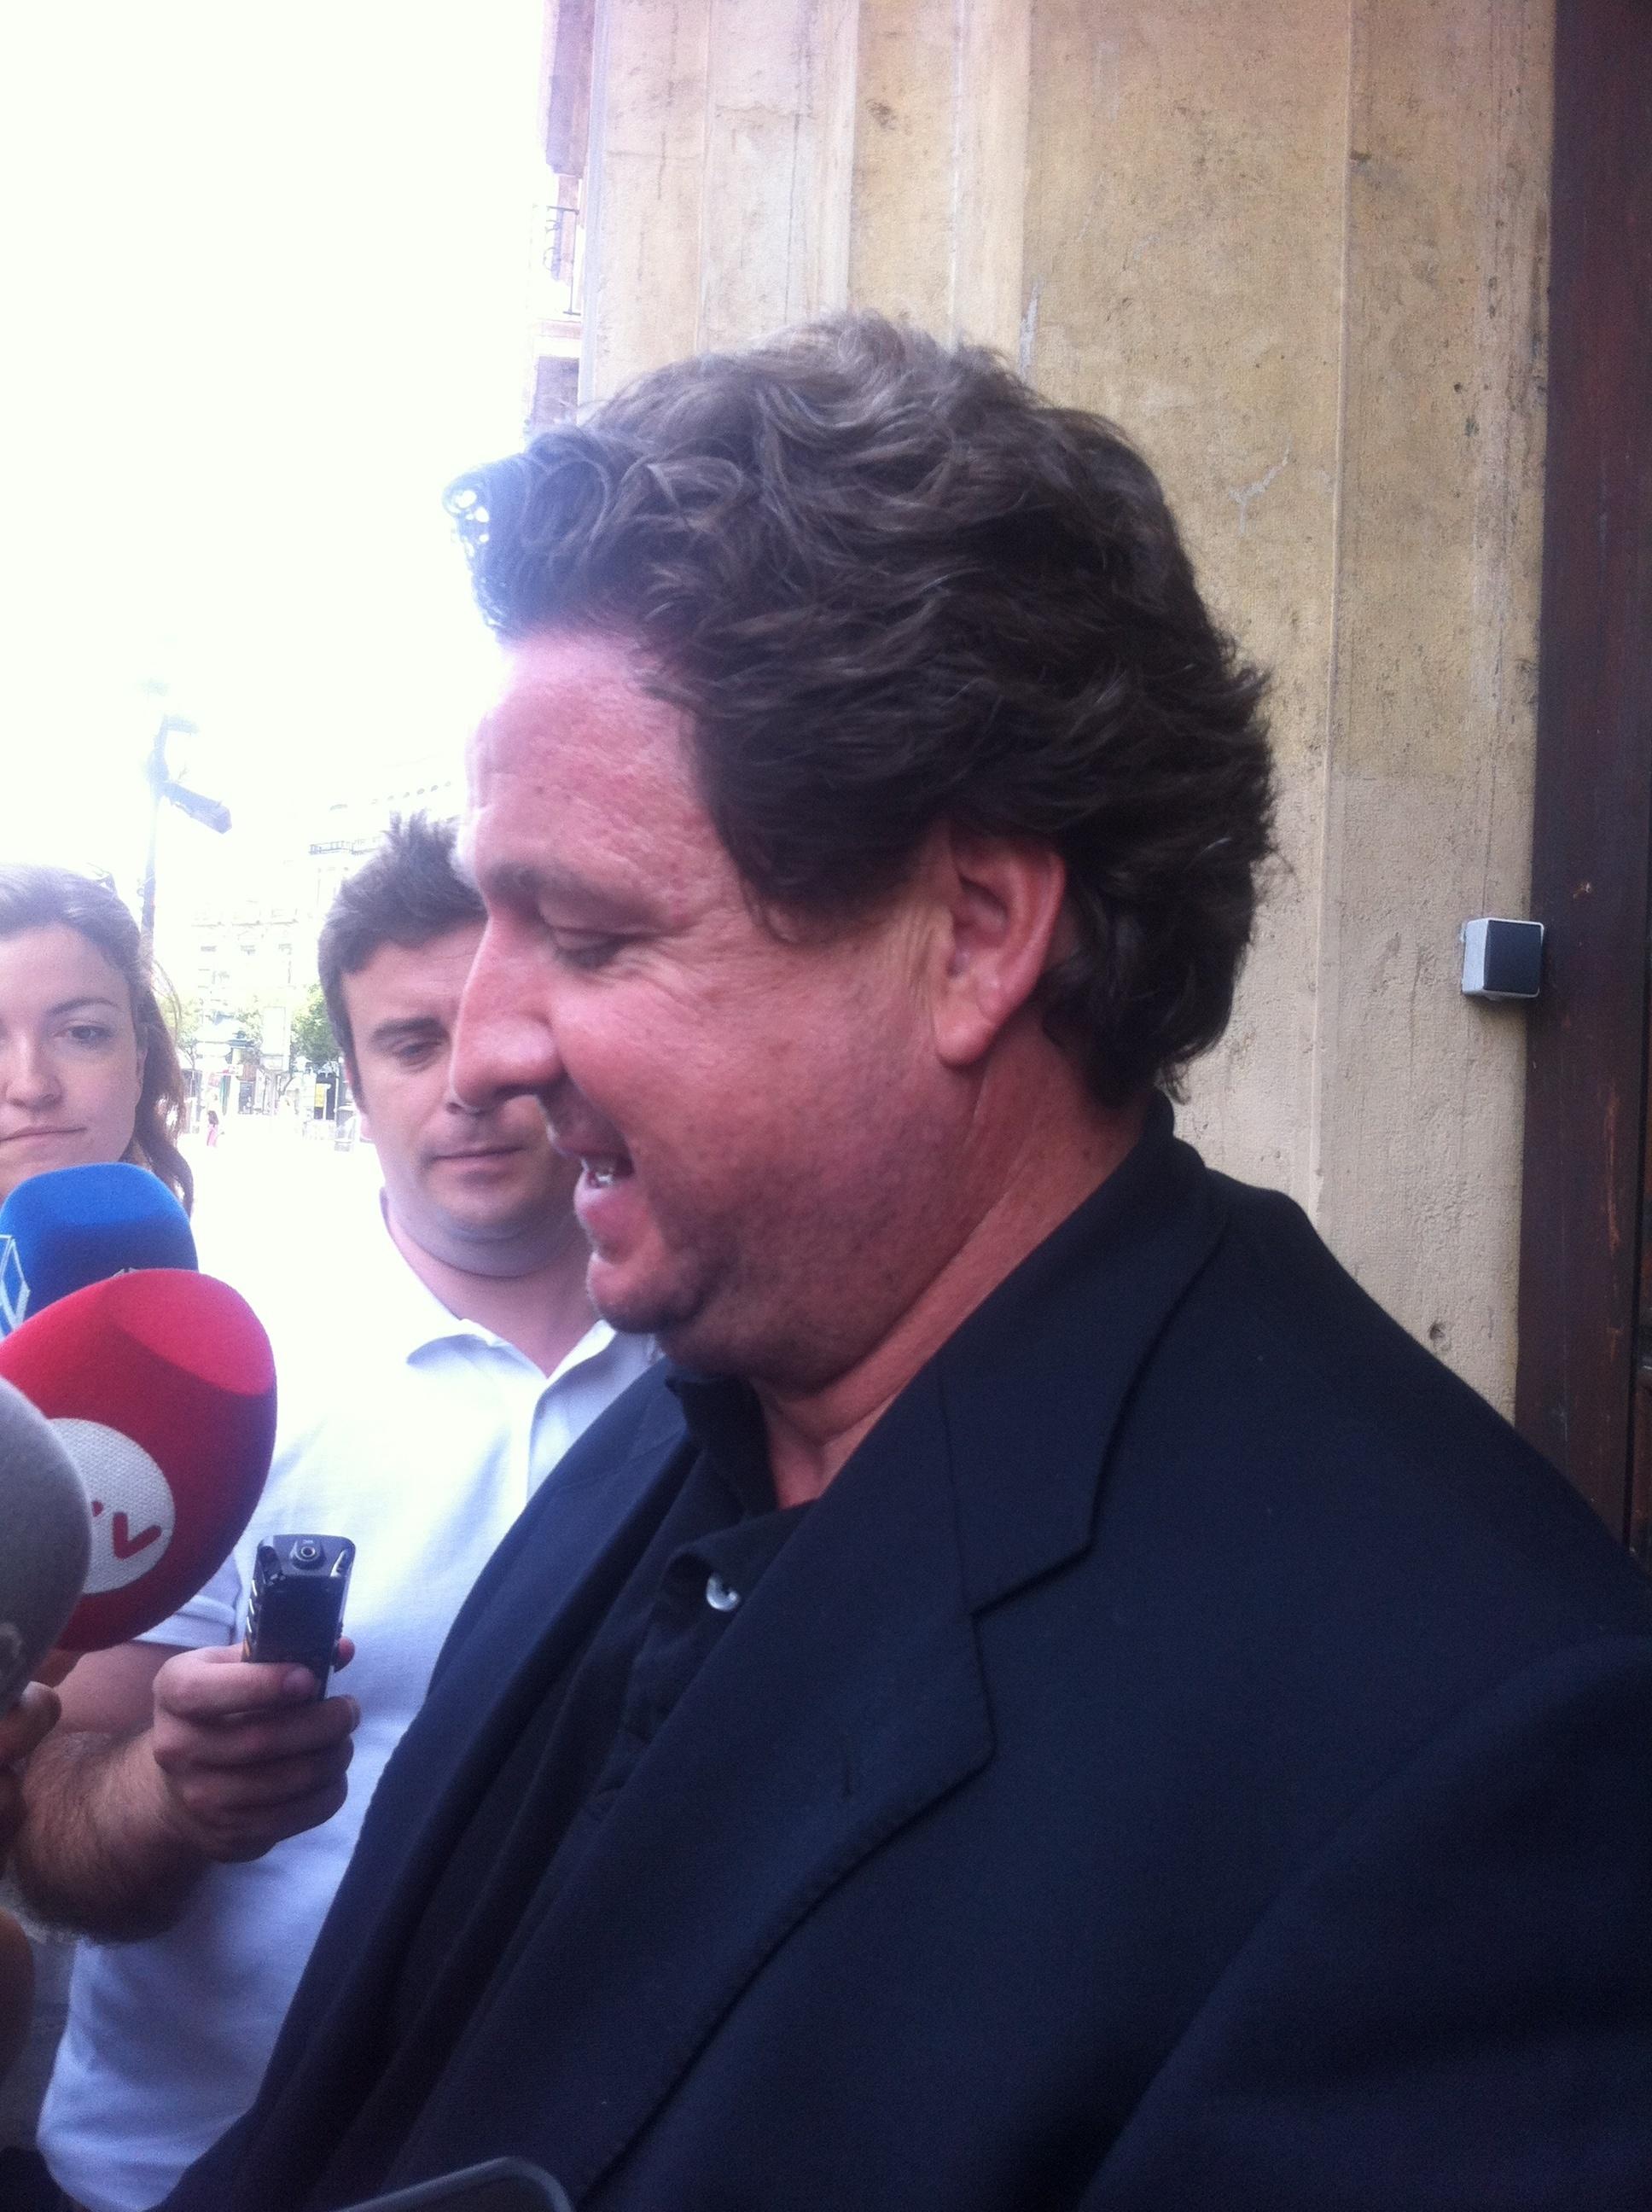 Exconcejal del PP ratifica que escuchó que la trama iba a hacer la visita del Papa